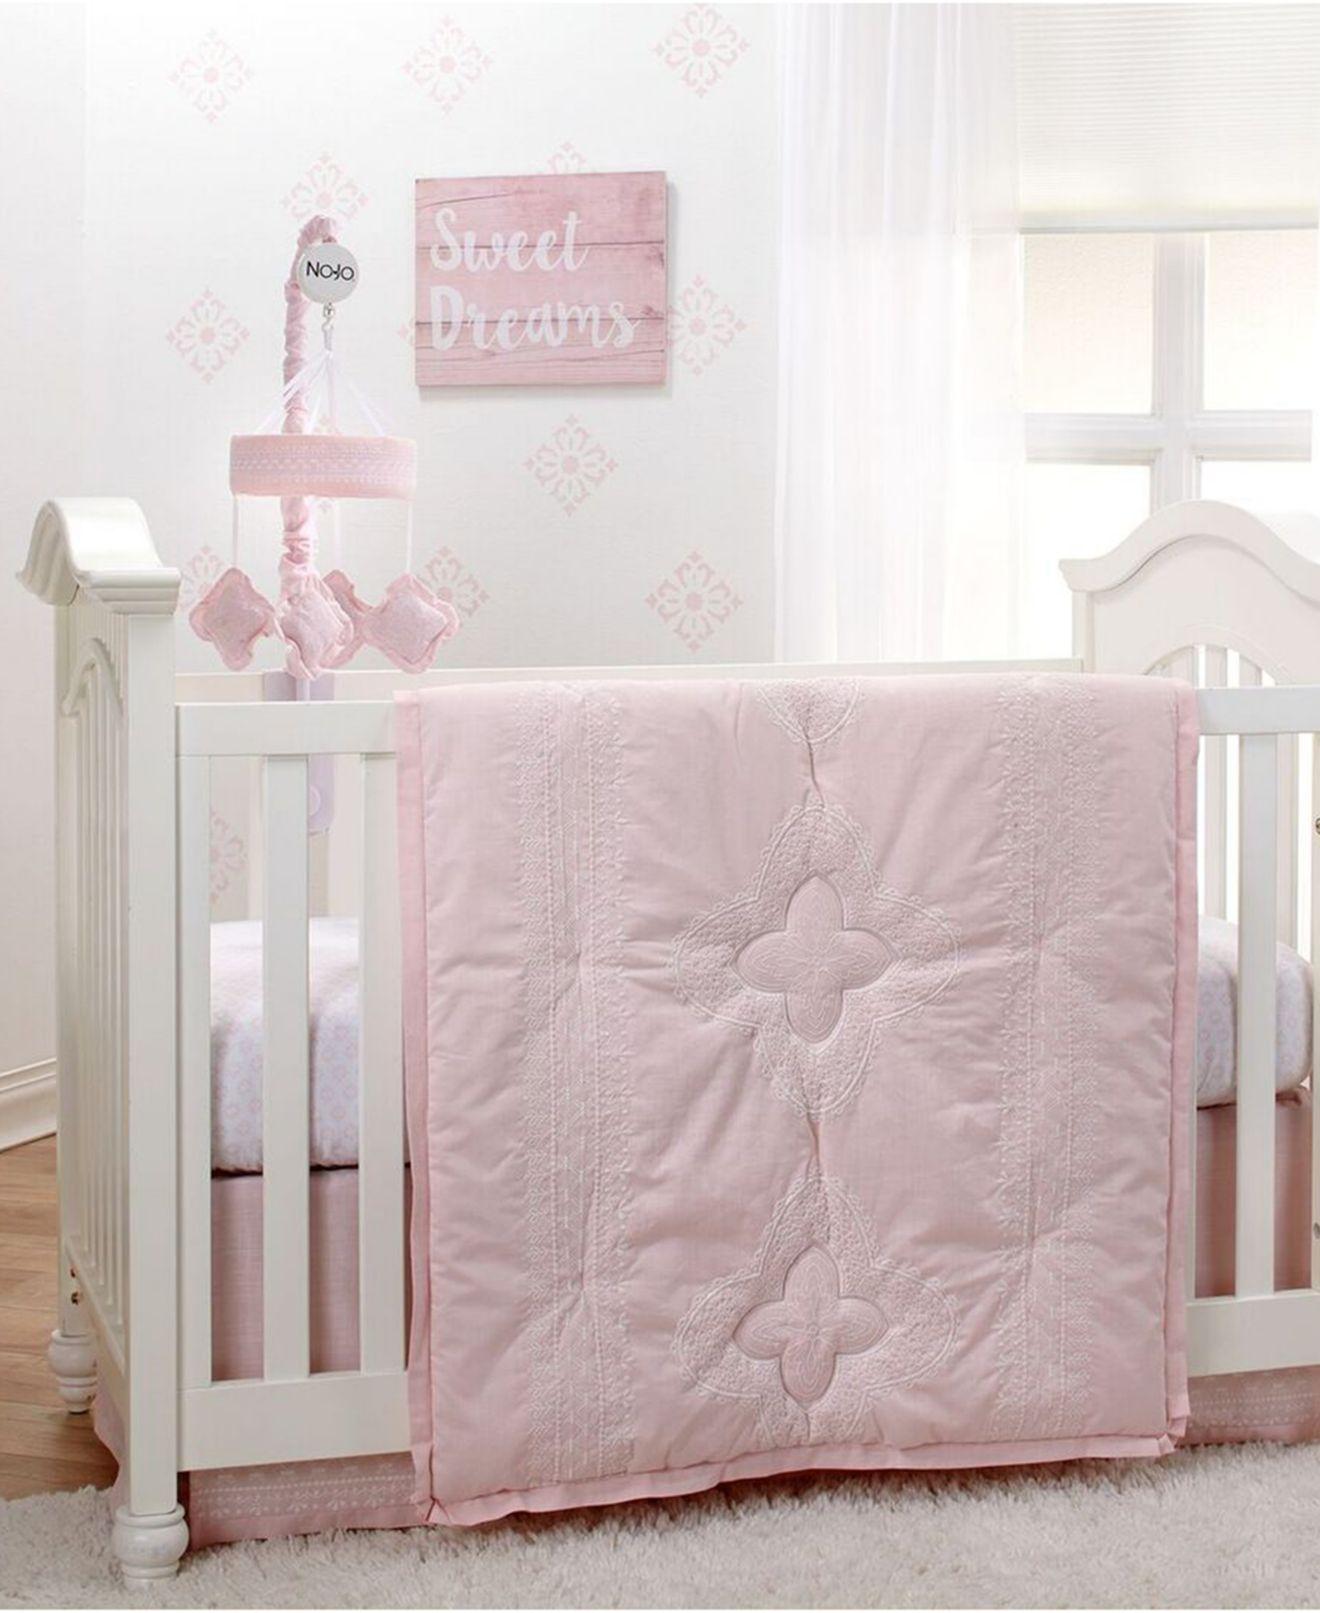 Bedding Kids & Baby Nursery Furniture Macy s